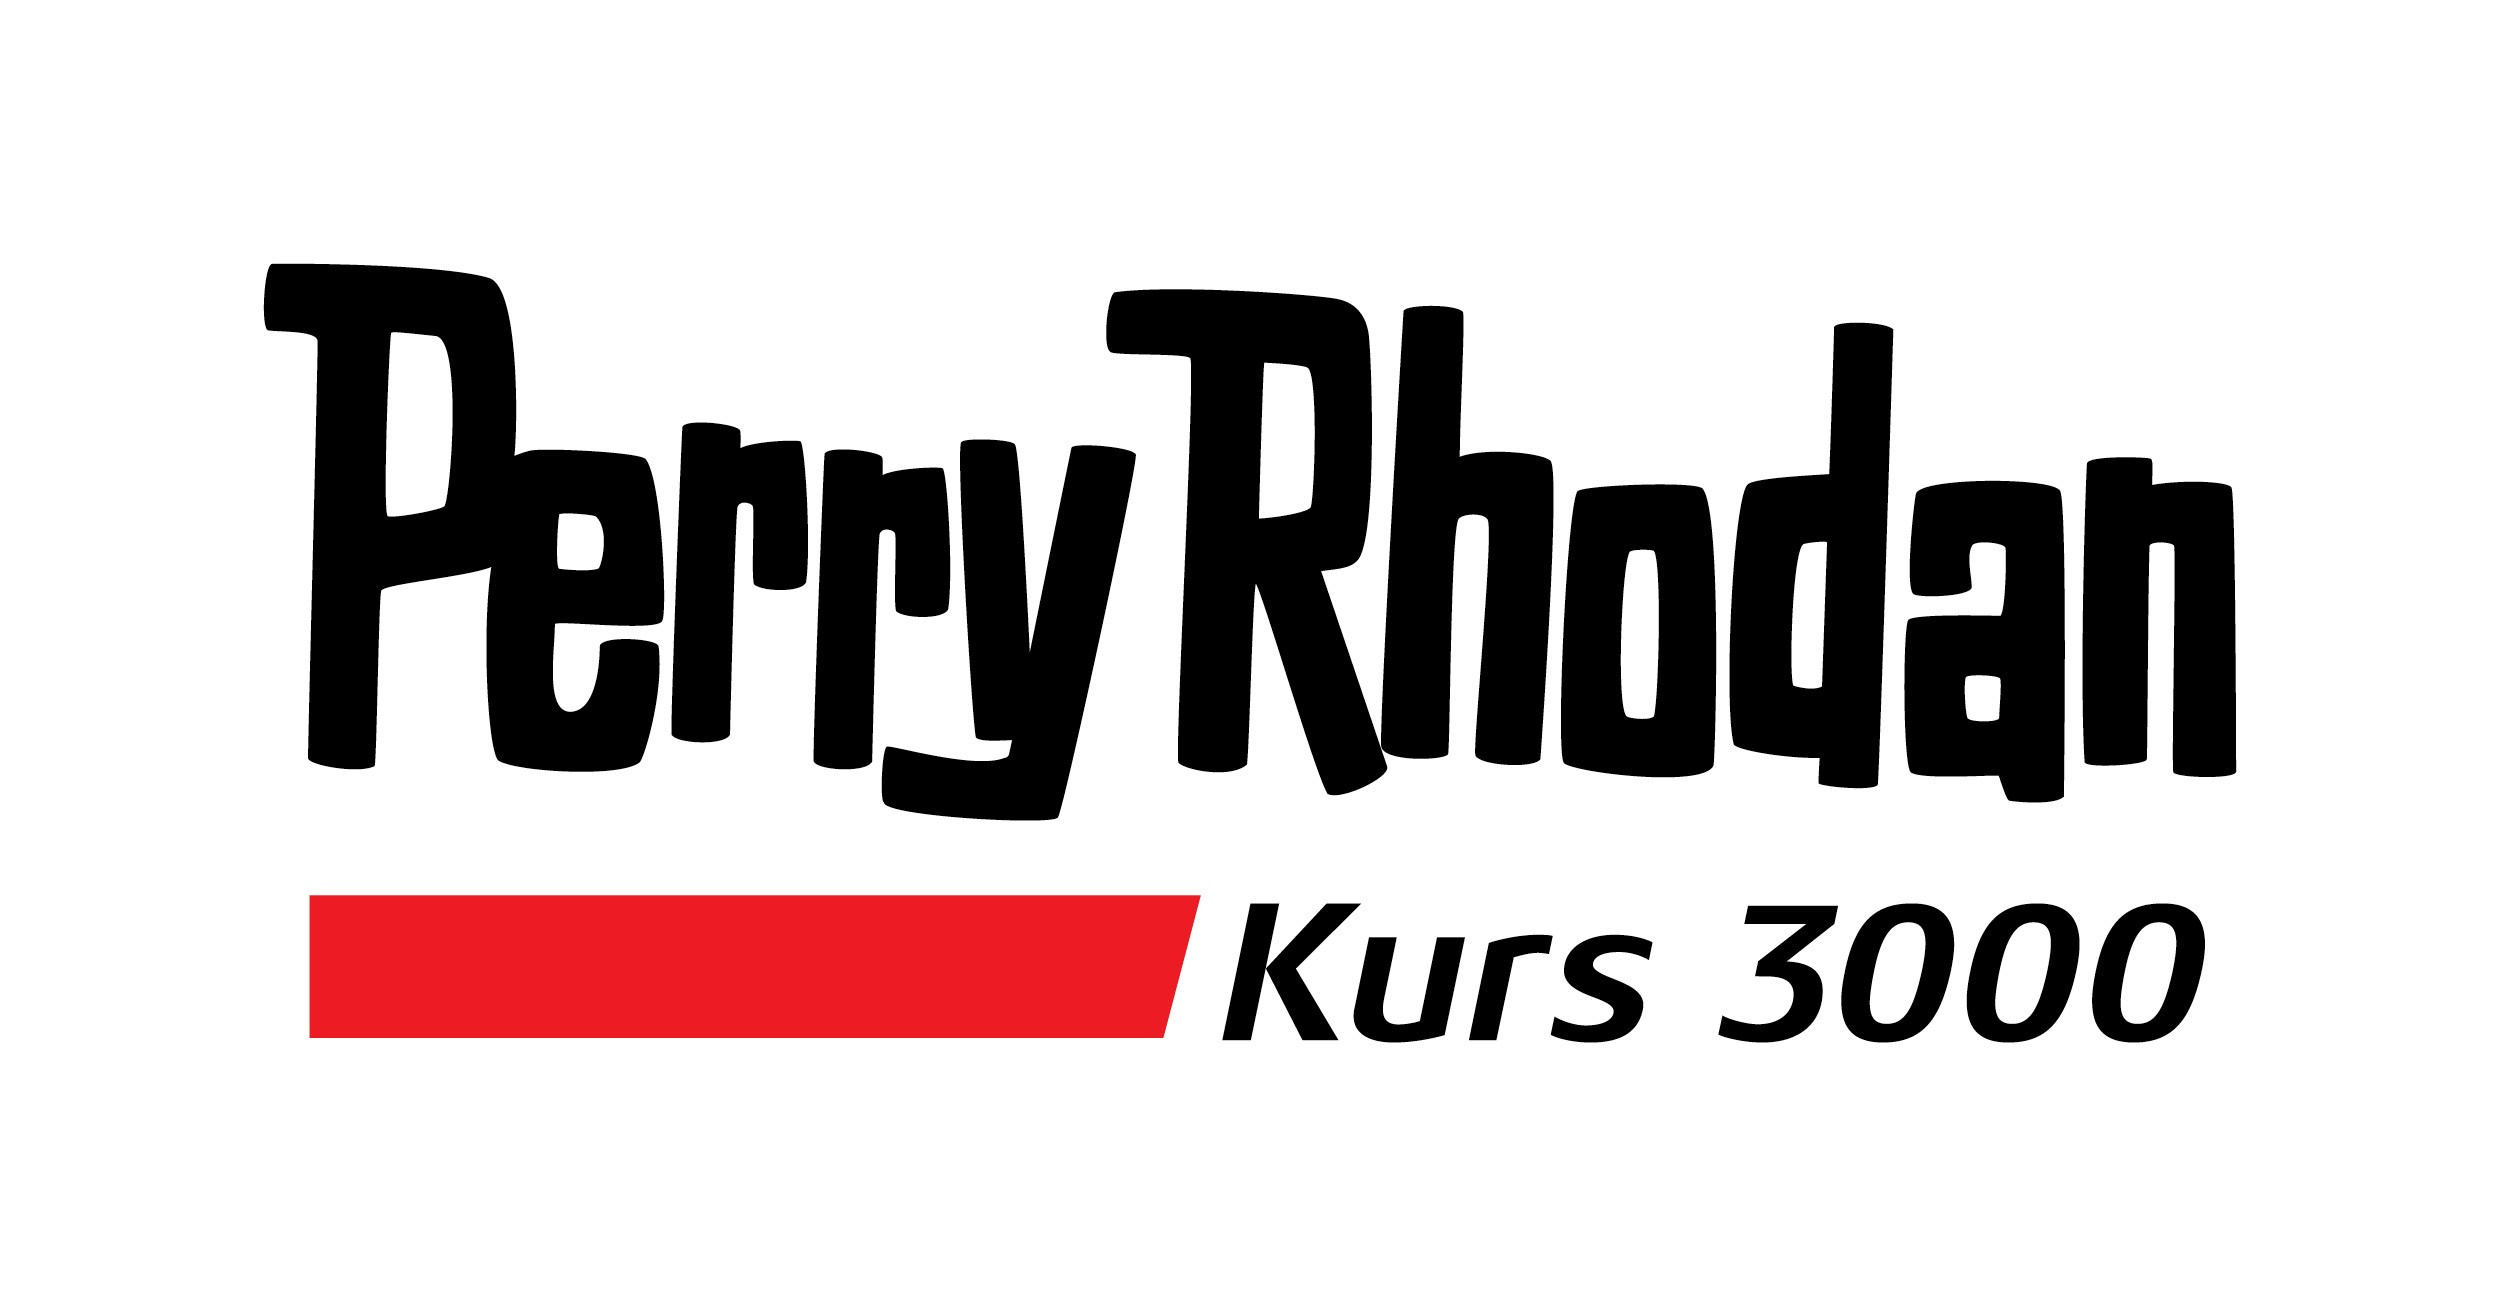 Perry Rhodan Kurs 3000 Vorverkauf Hat Begonnen Perry Rhodan